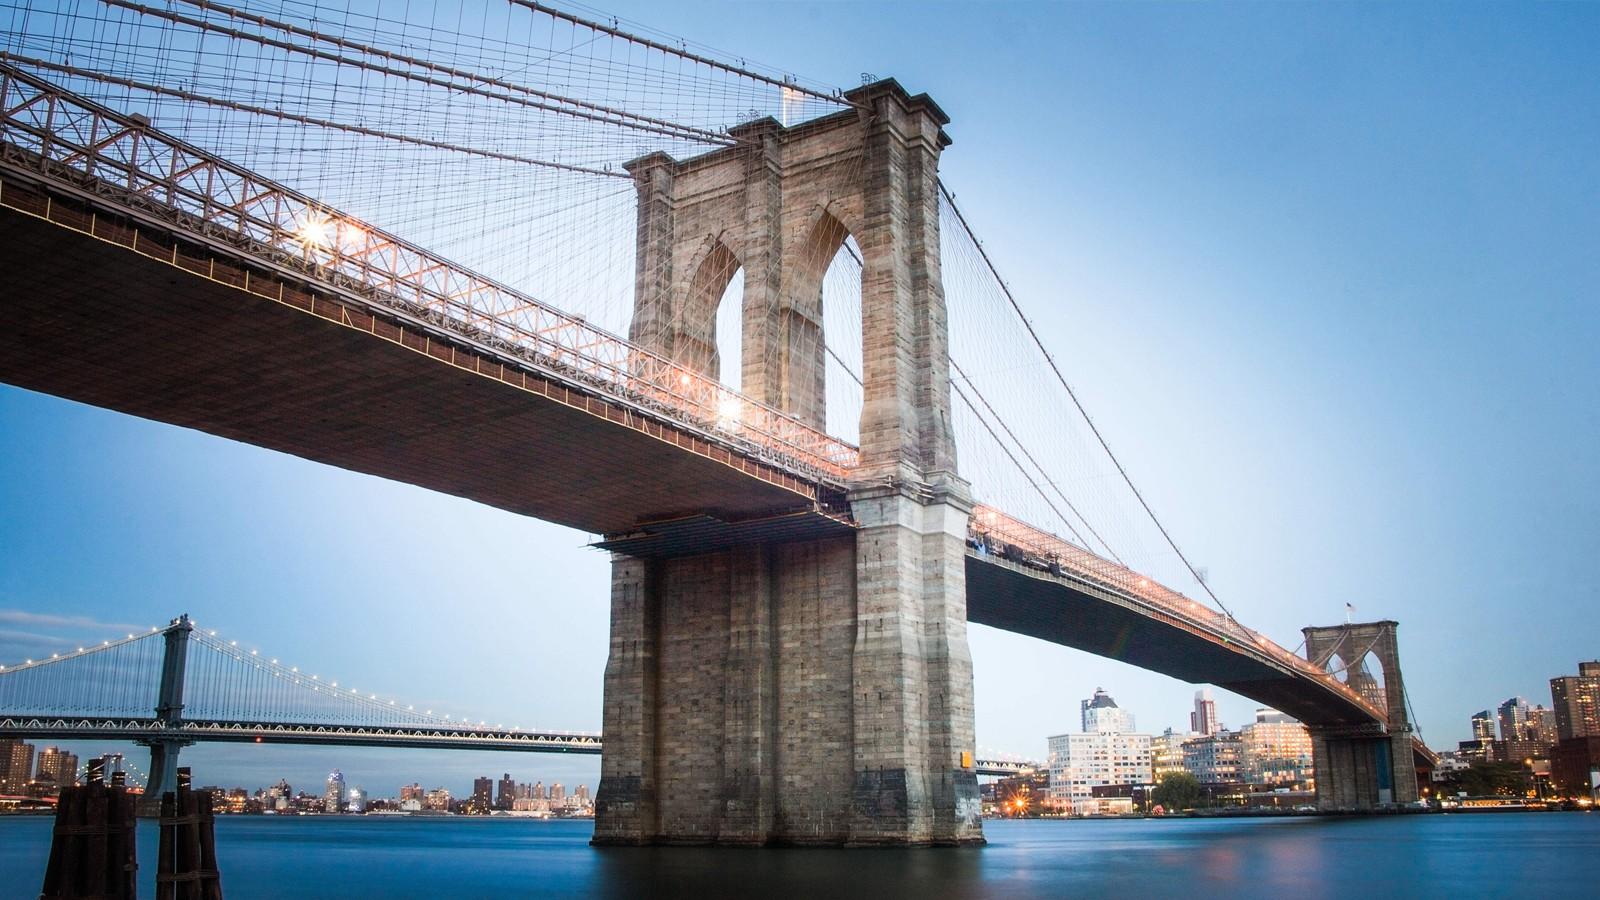 "<a href=""https://www.habonim.net/happenings-at-habonim.html""                                     target="""">                                                                 <span class=""slider_title"">                                     HABONIM READS! Next Up: Brooklyn Bridge by Karen Hesse                                </span>                                                                 </a>                                                                                                                                                                                      <a href=""https://www.habonim.net/happenings-at-habonim.html"" class=""slider_link""                             target="""">                             Click here to learn more!                            </a>"